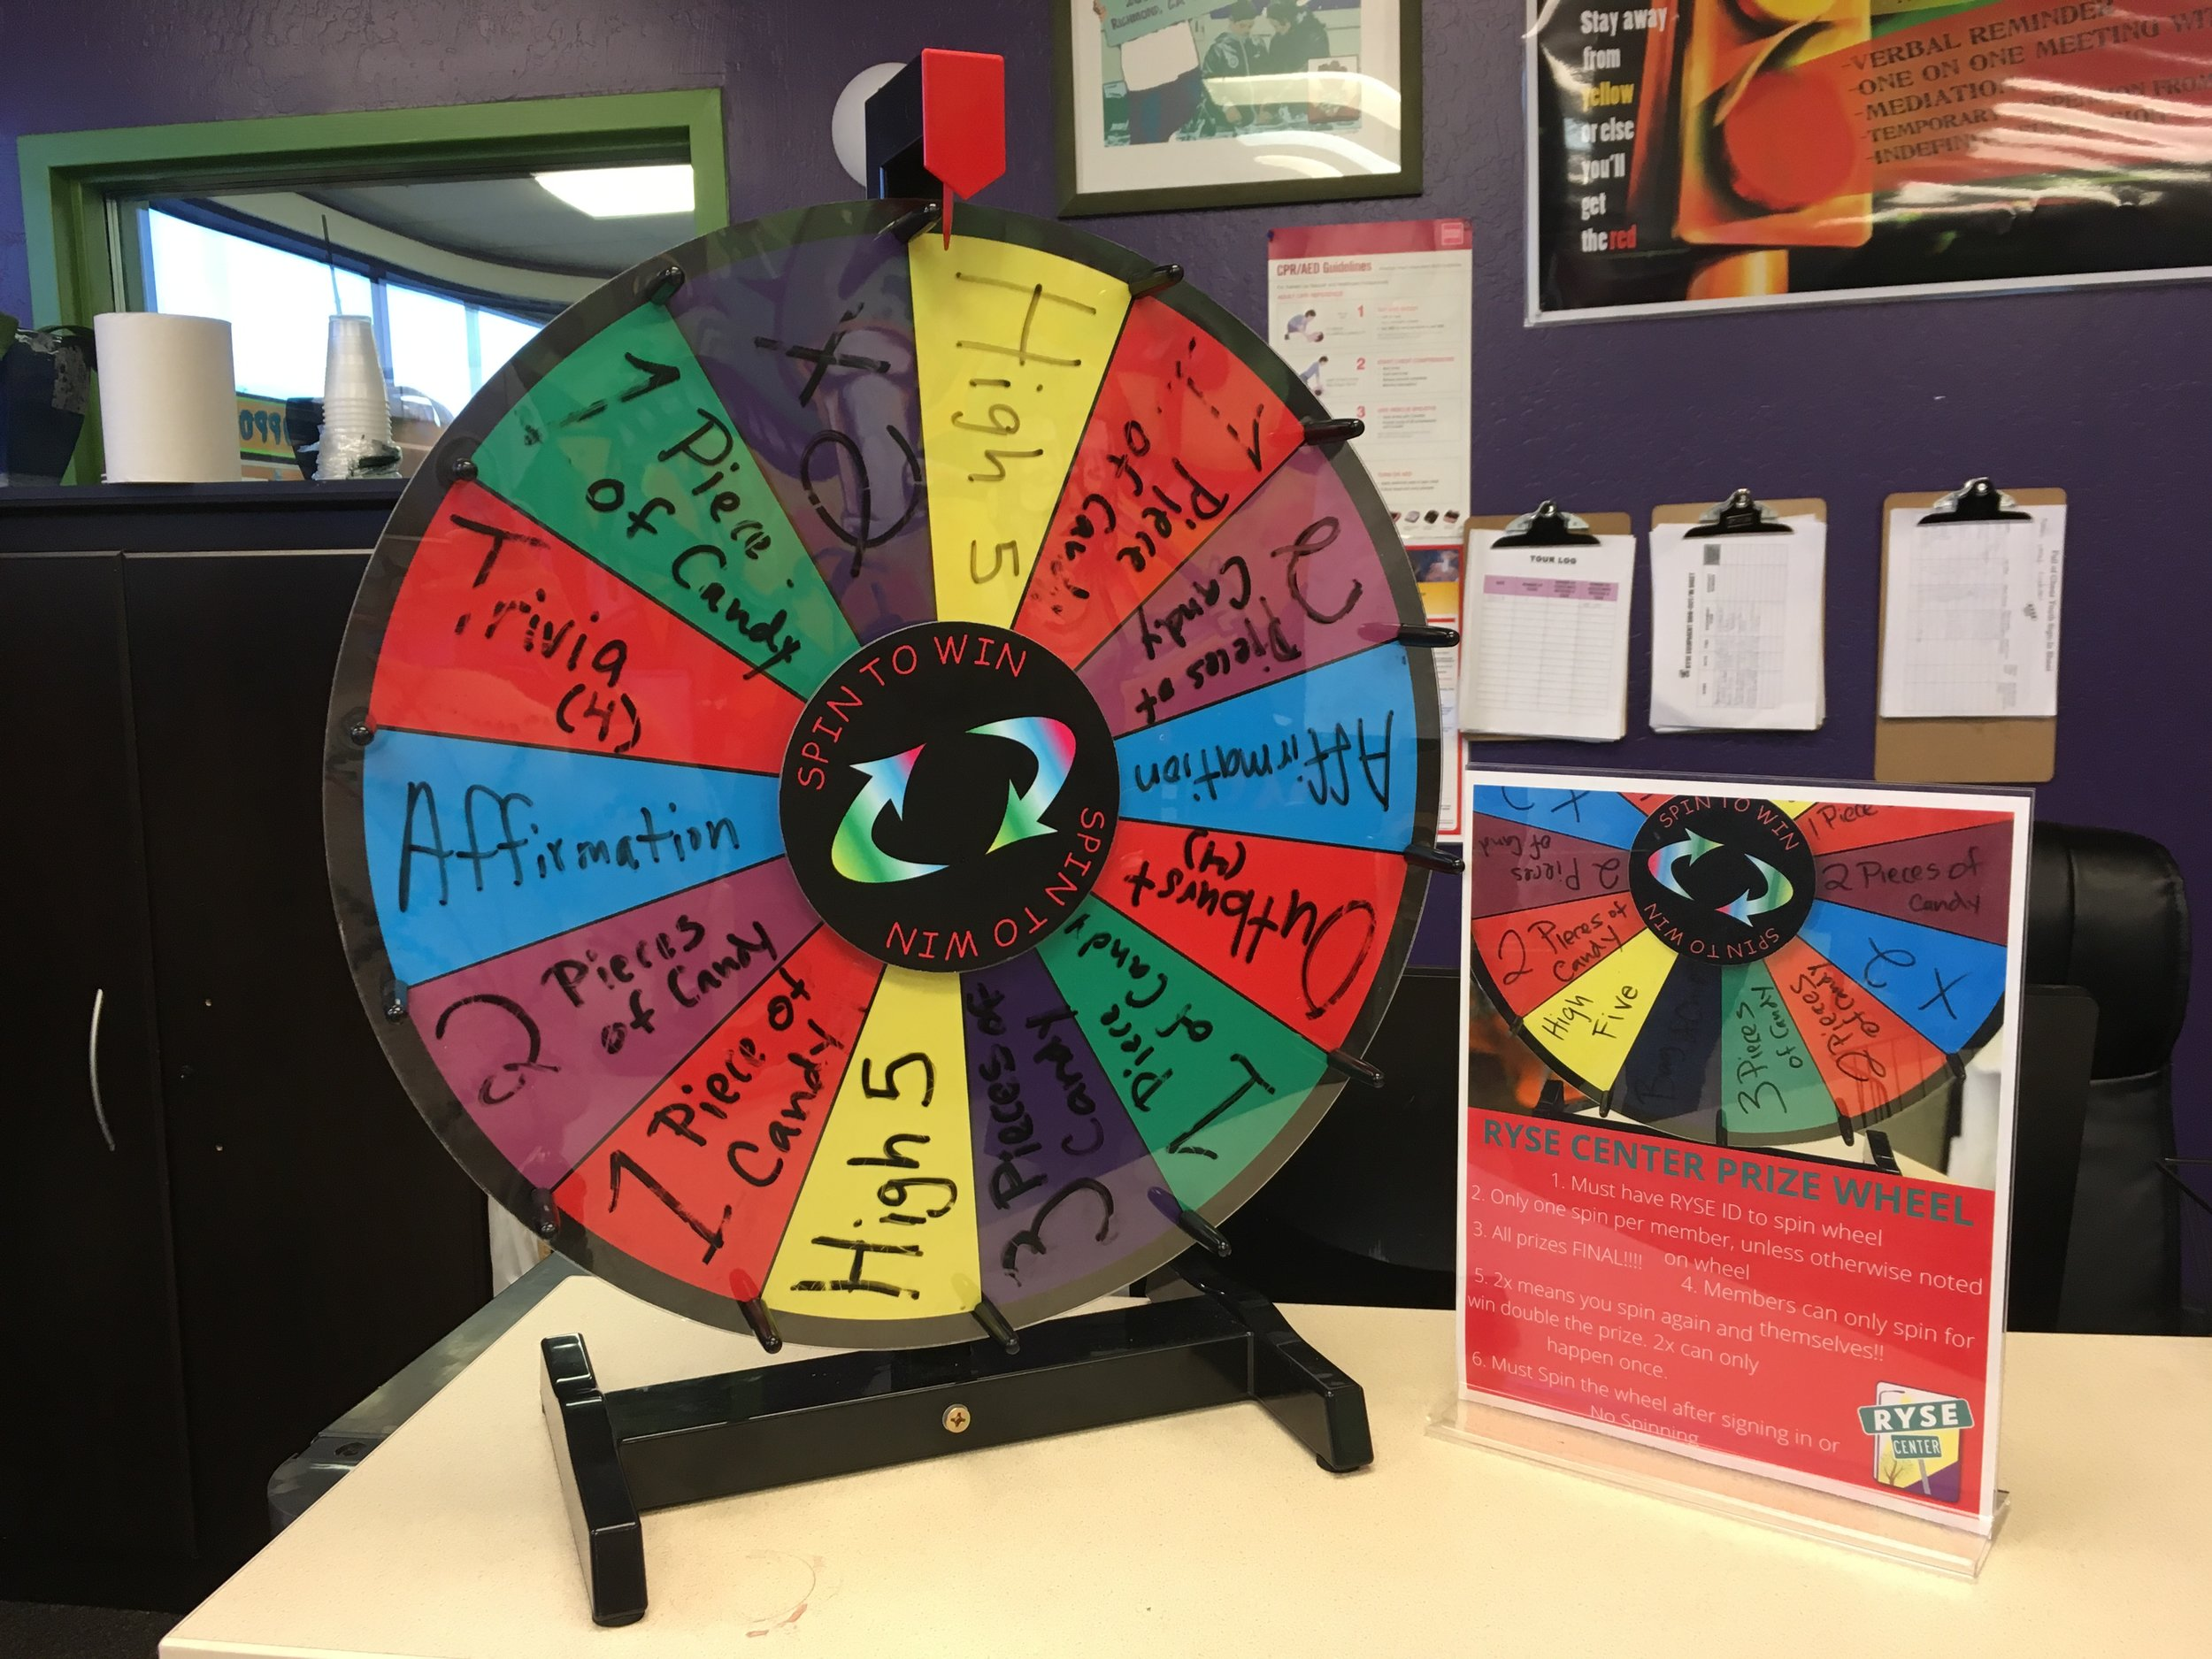 RYSE Center Prize Wheel